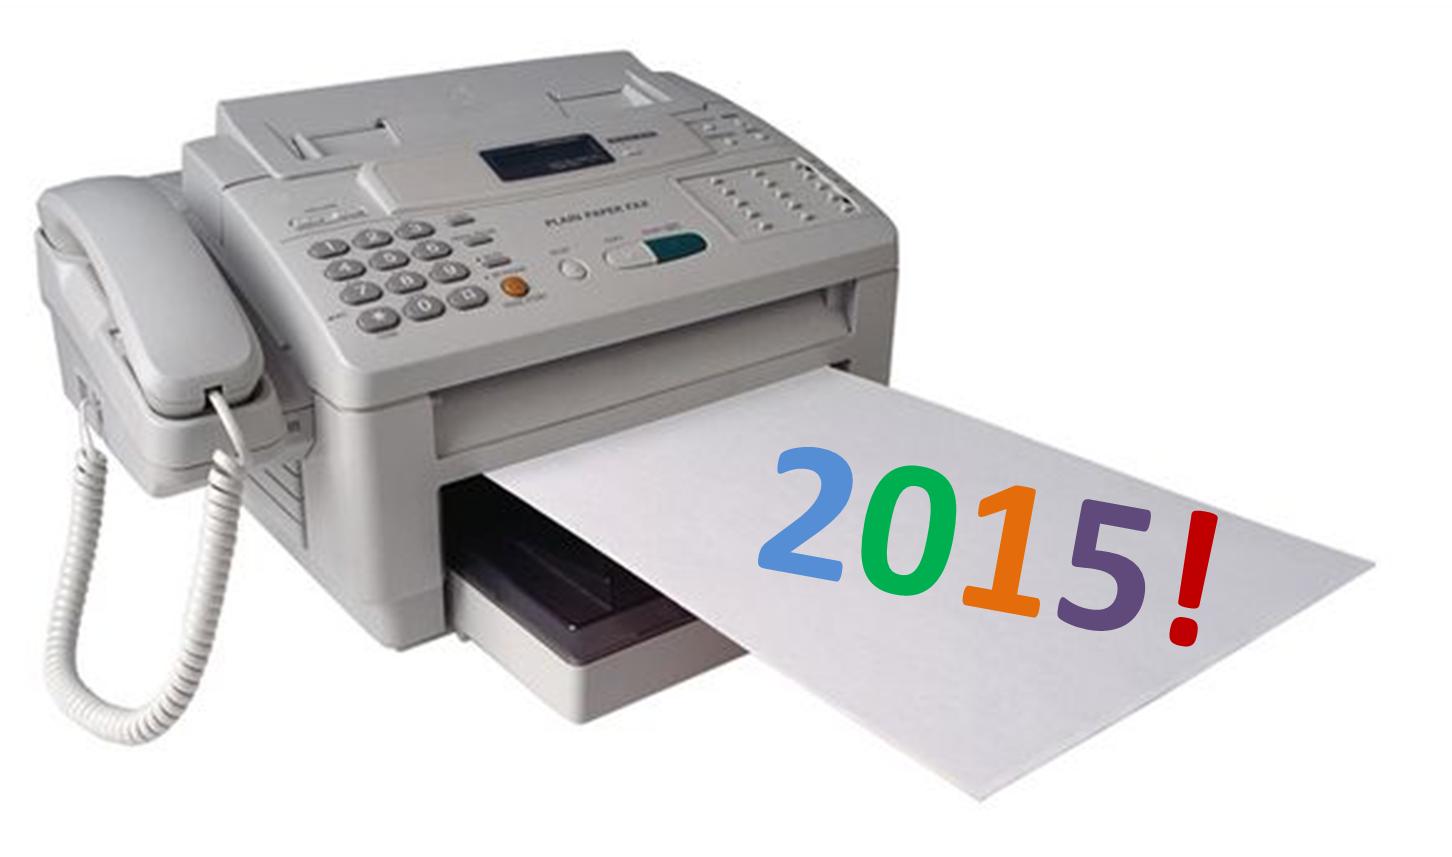 i a fax machine but no landline